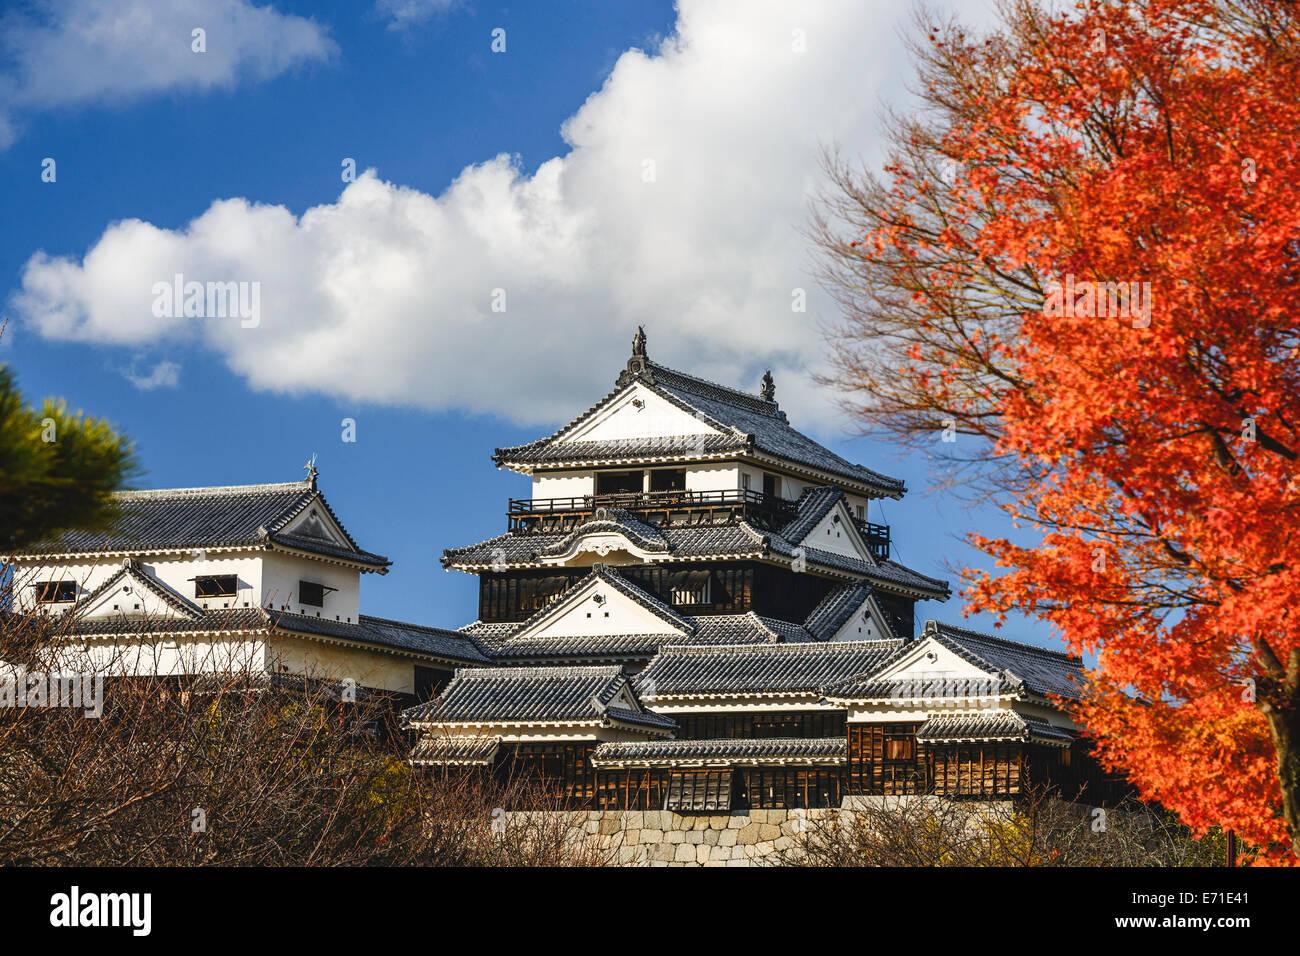 Matsuyama Castle à Matsuyama, Japon. Photo Stock